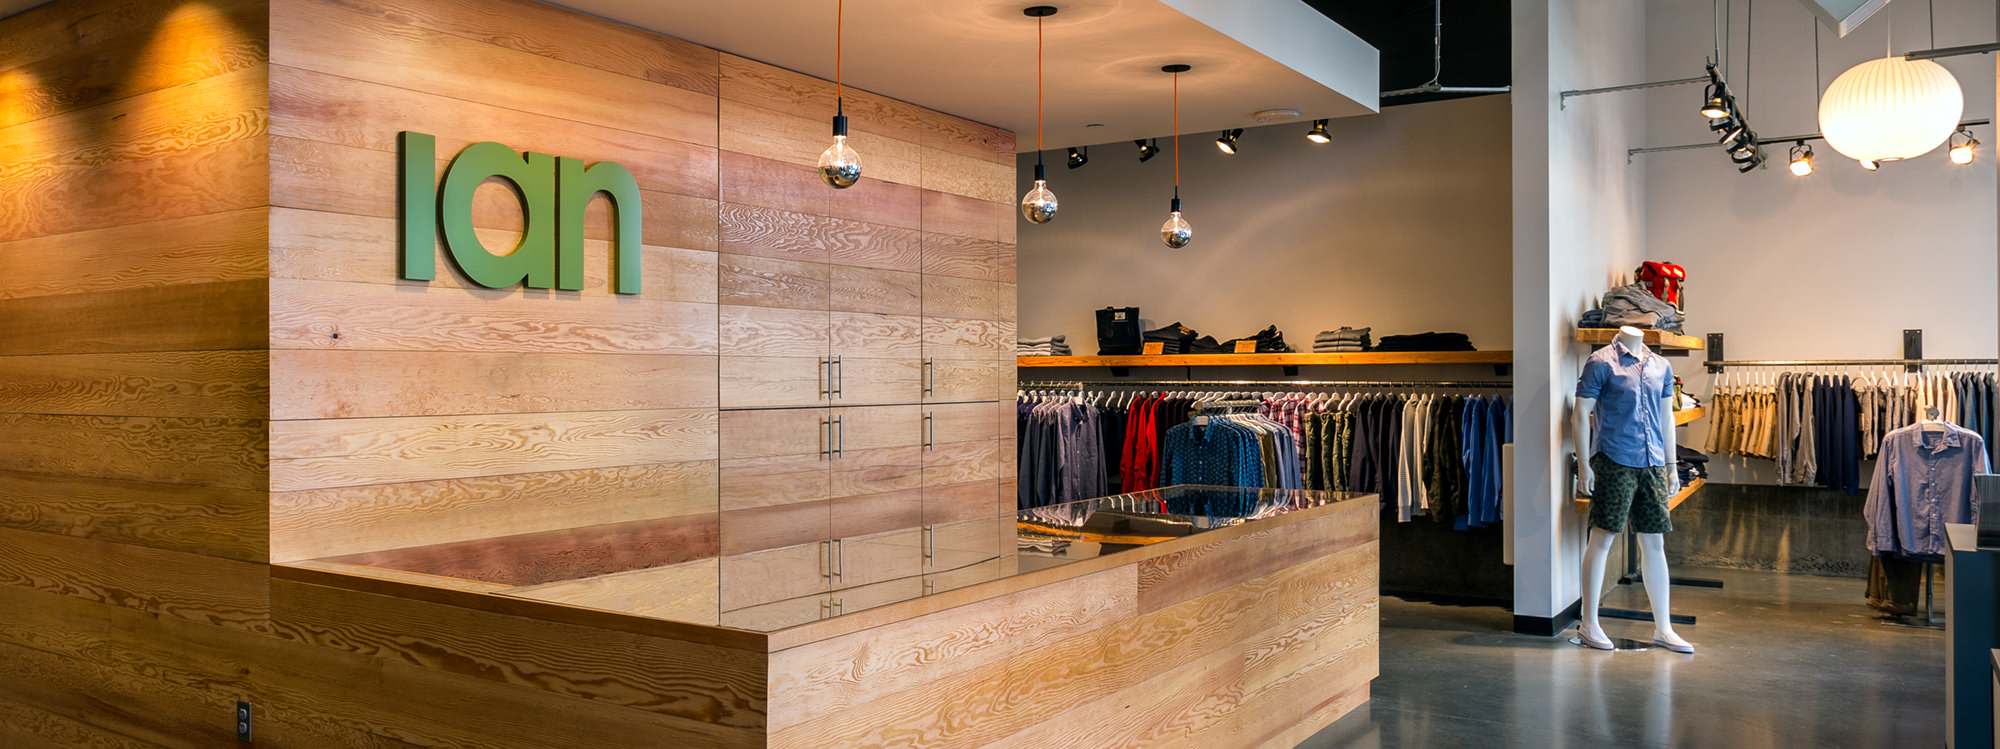 Ian Men's Store